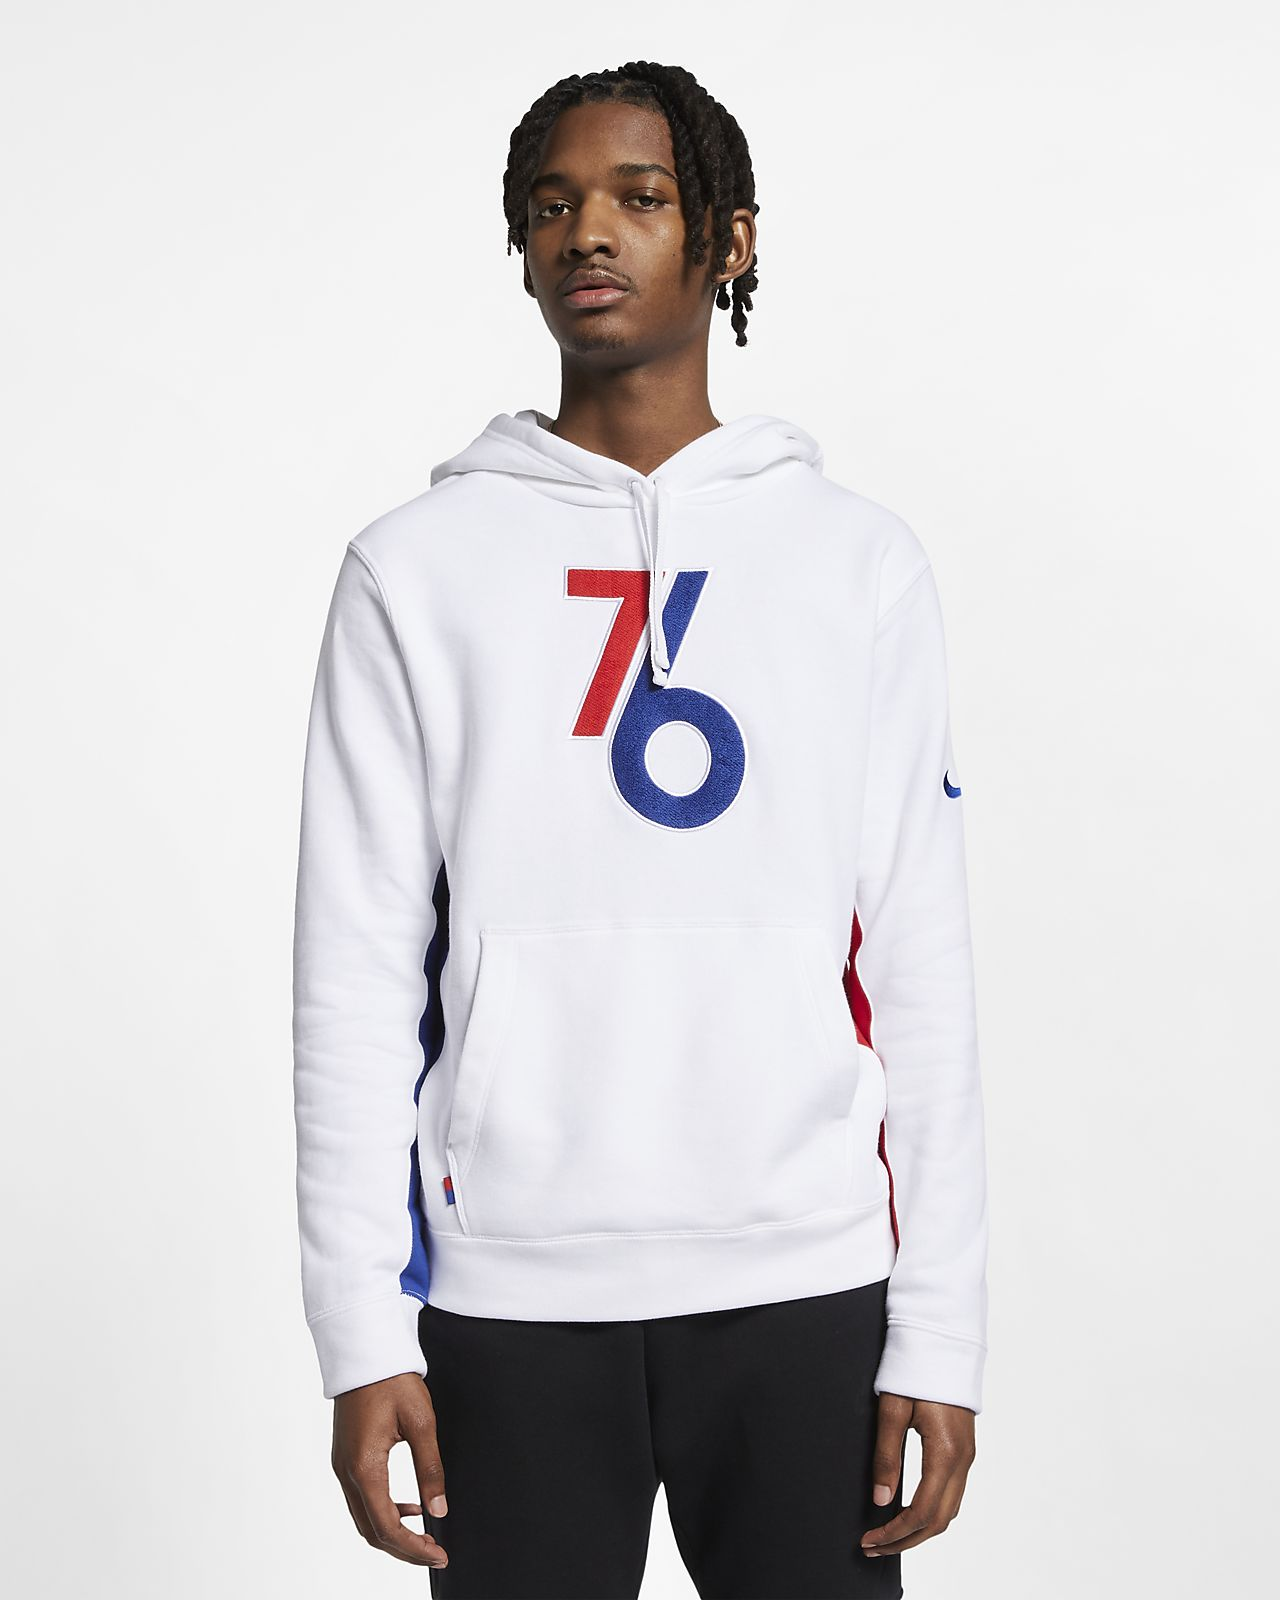 Philadelphia 76ers Nike NBA-hoodie voor heren